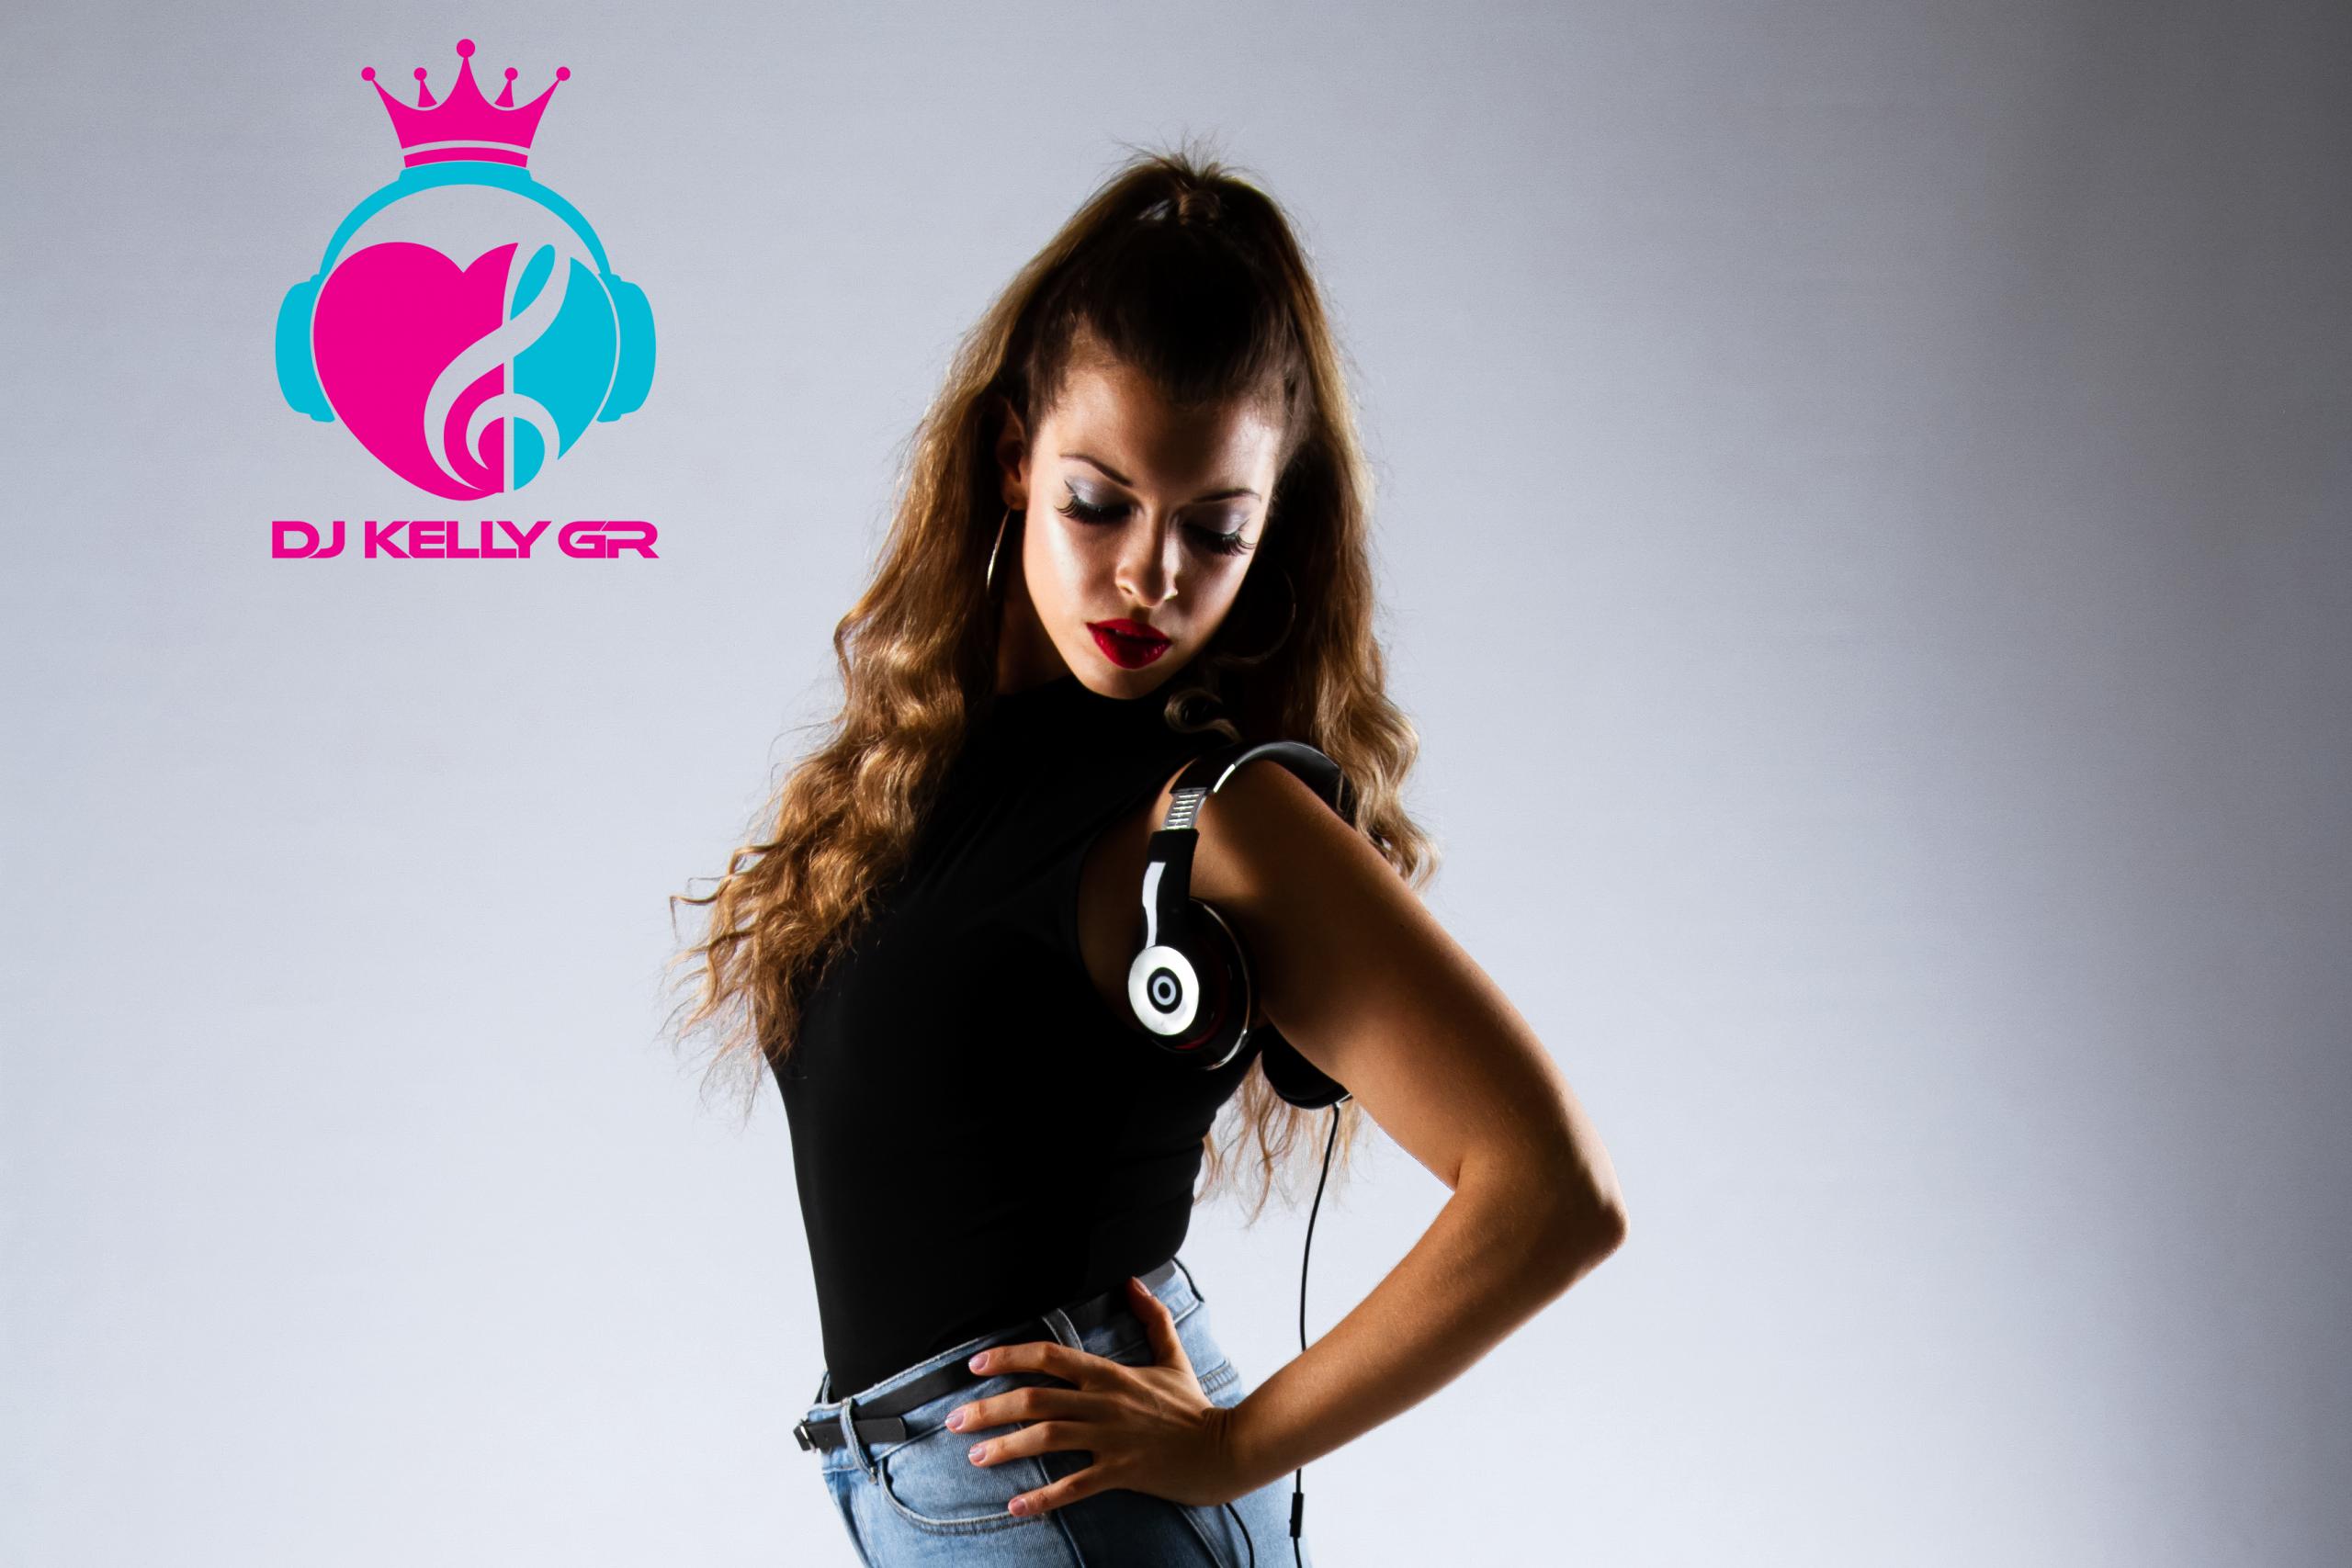 DJ KELLY 600x400